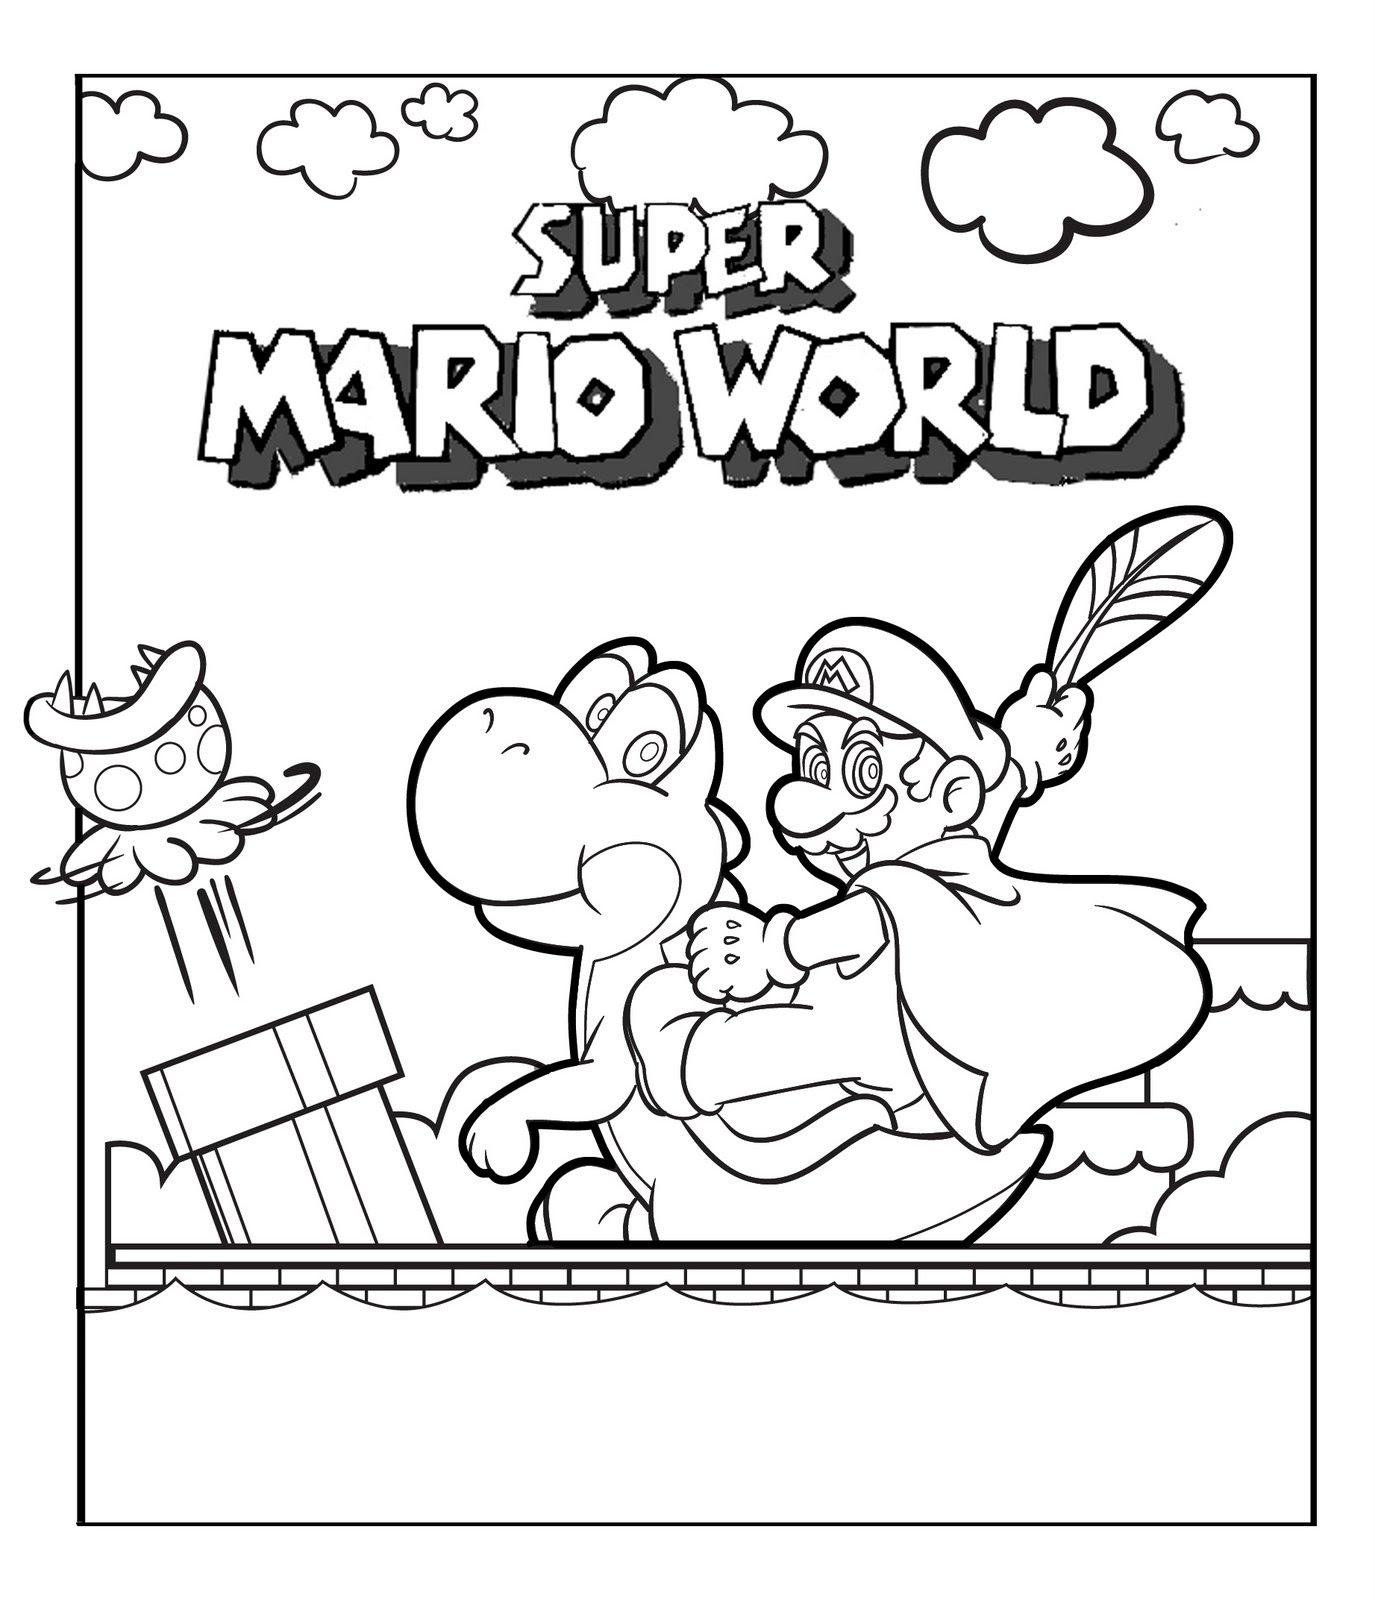 Colour Mario In